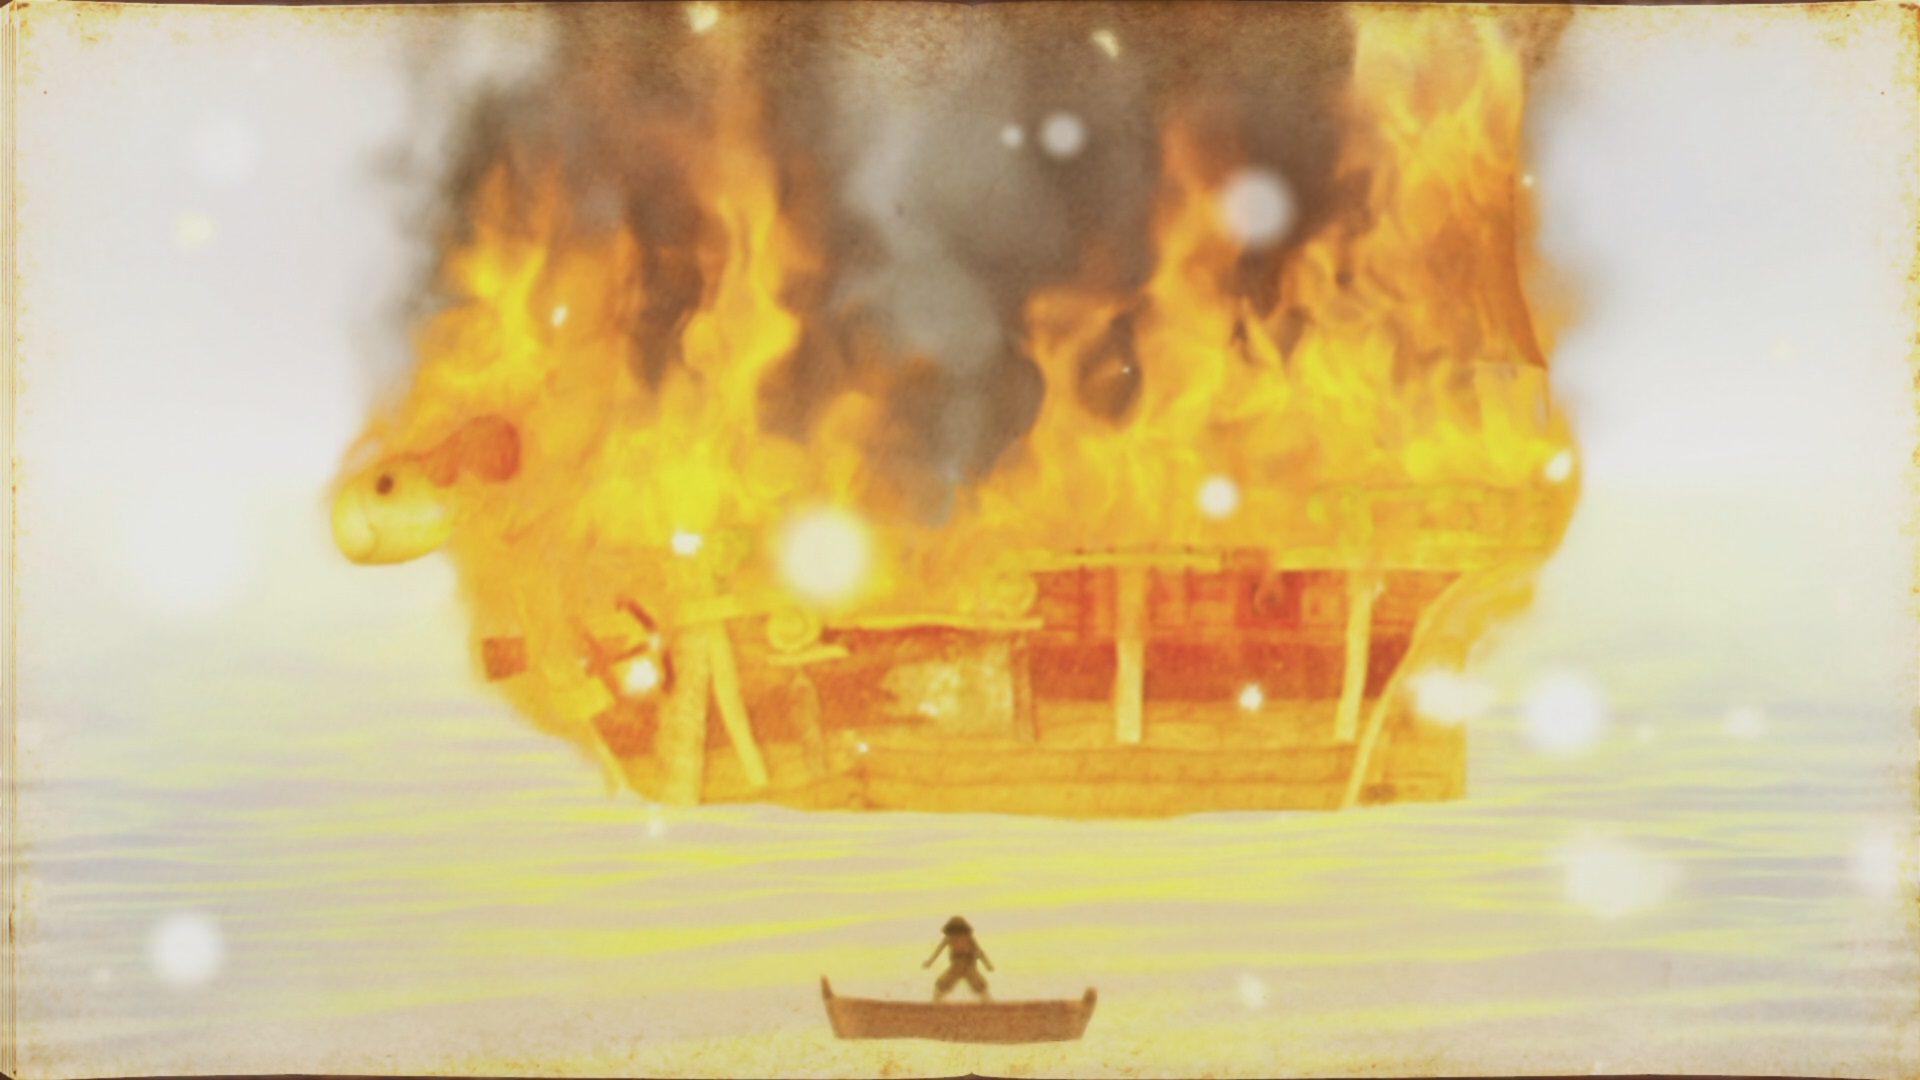 Merry quemándose en One Piece Pirate Warriors 4